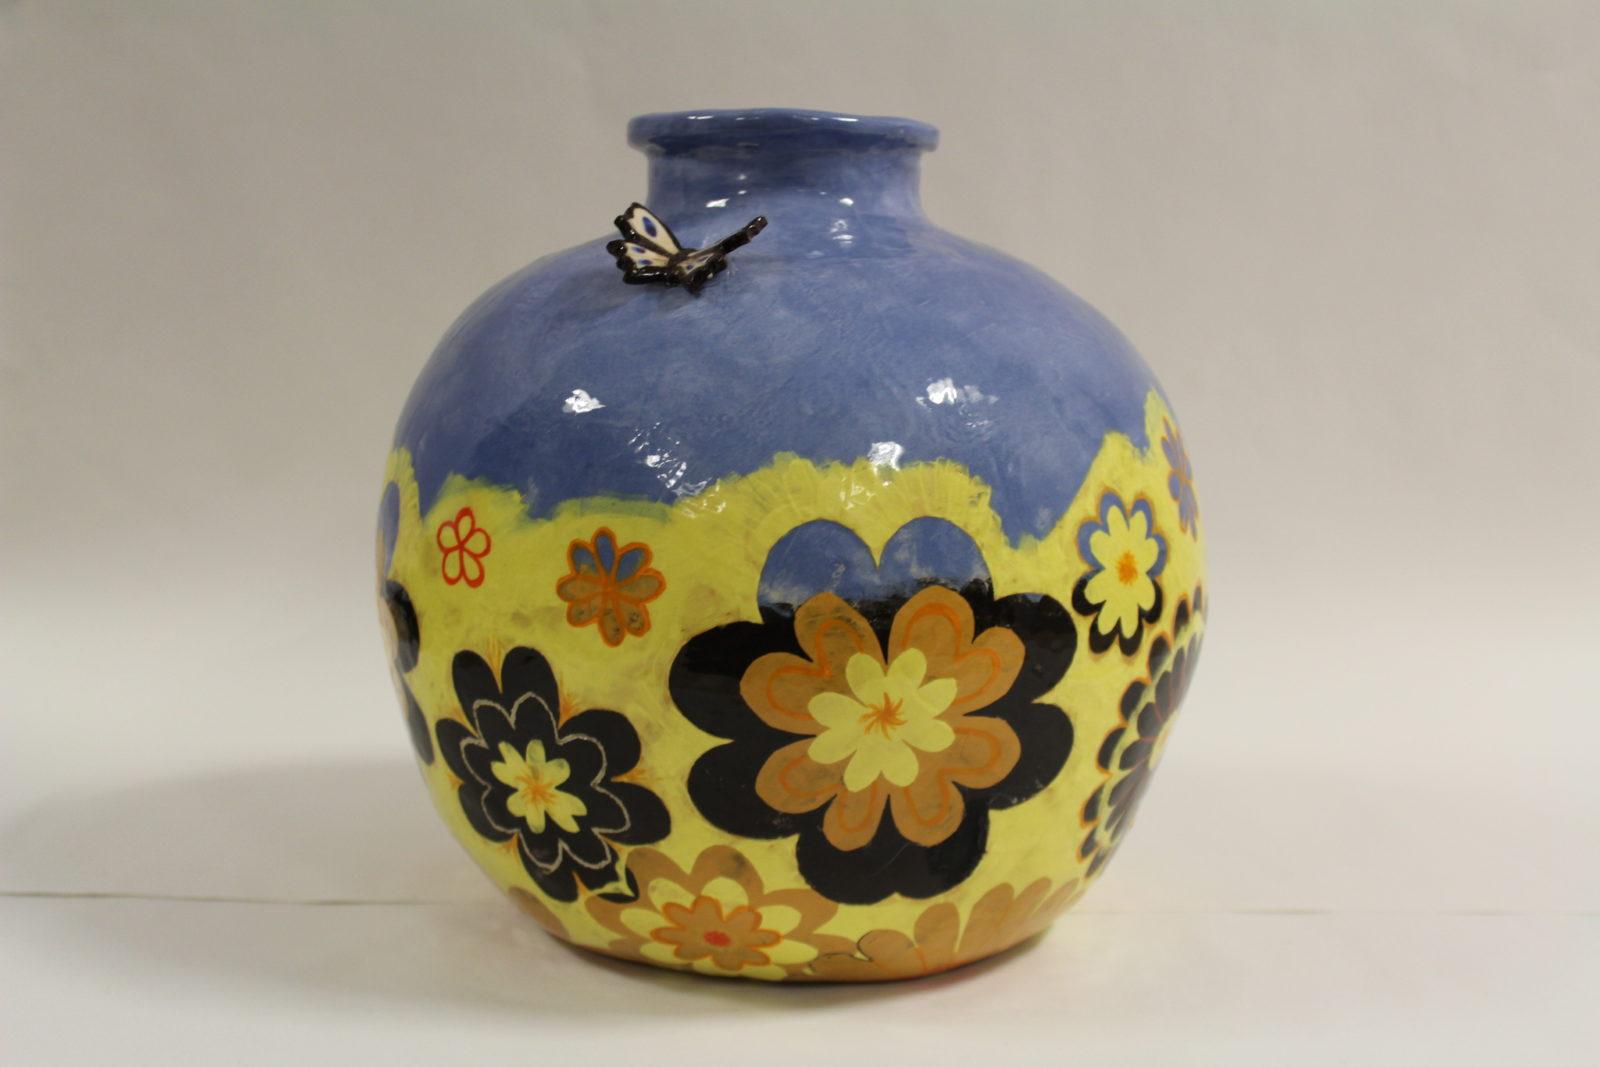 37669 || 5662 || Summer Meadows Vase